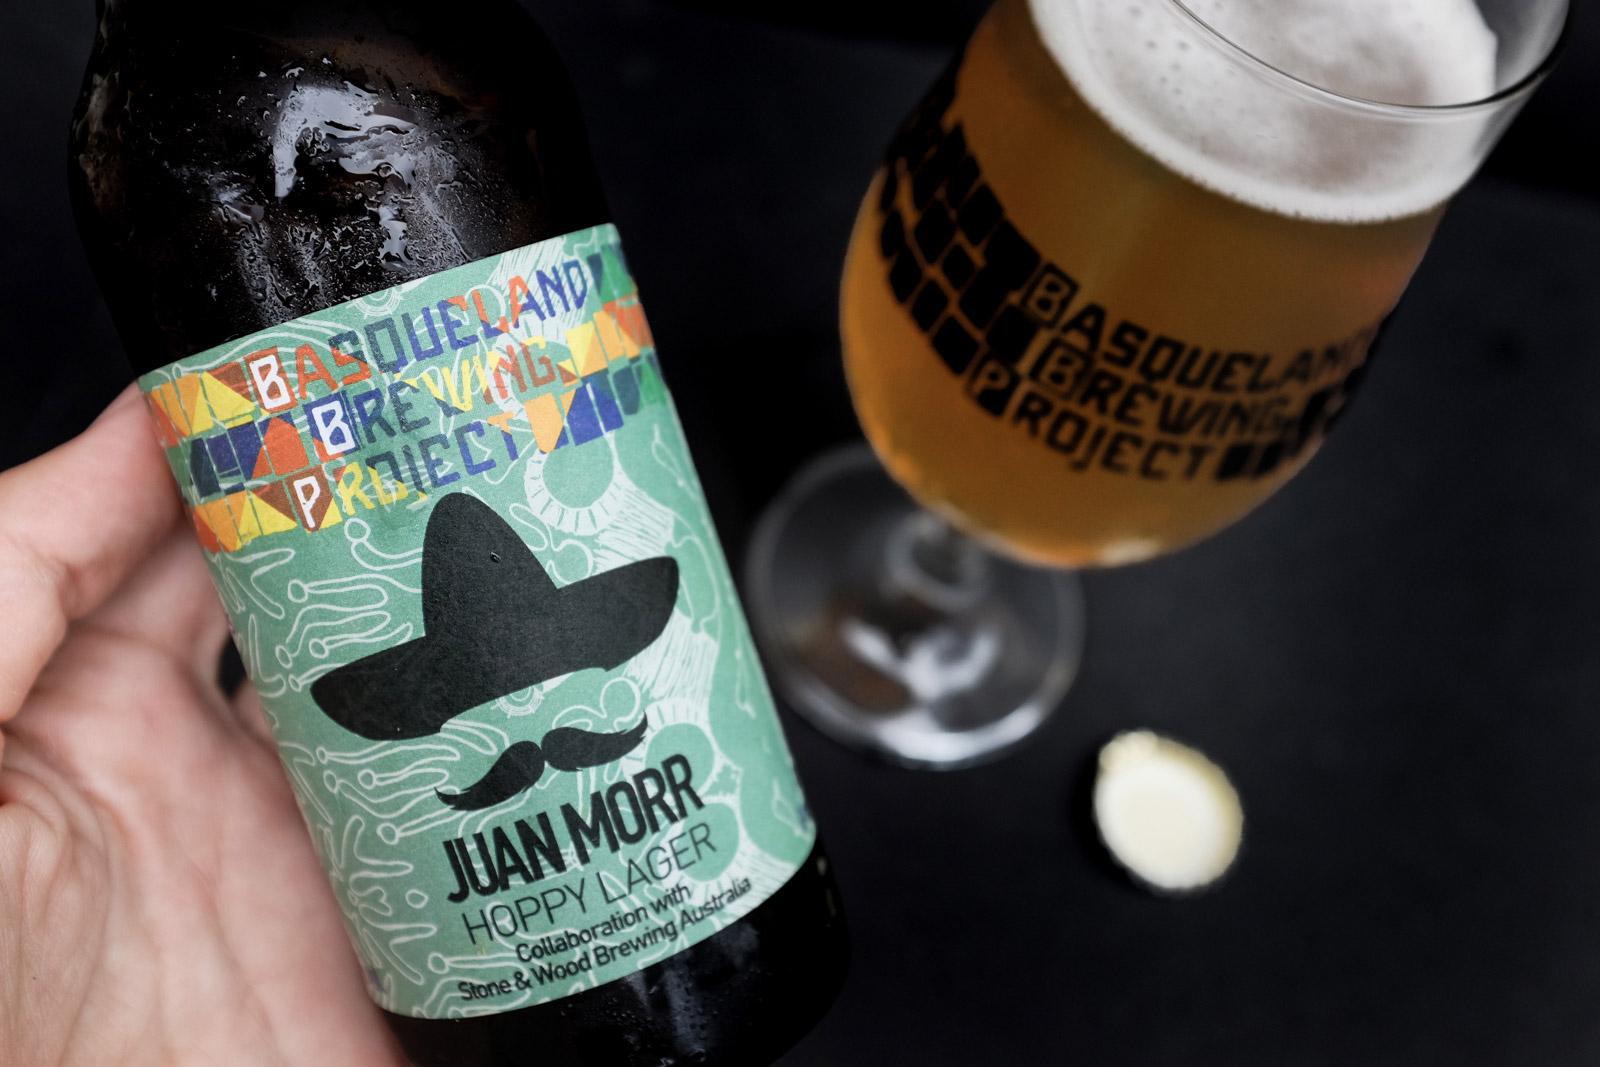 Basqueland Brewing - Juan Morr beer